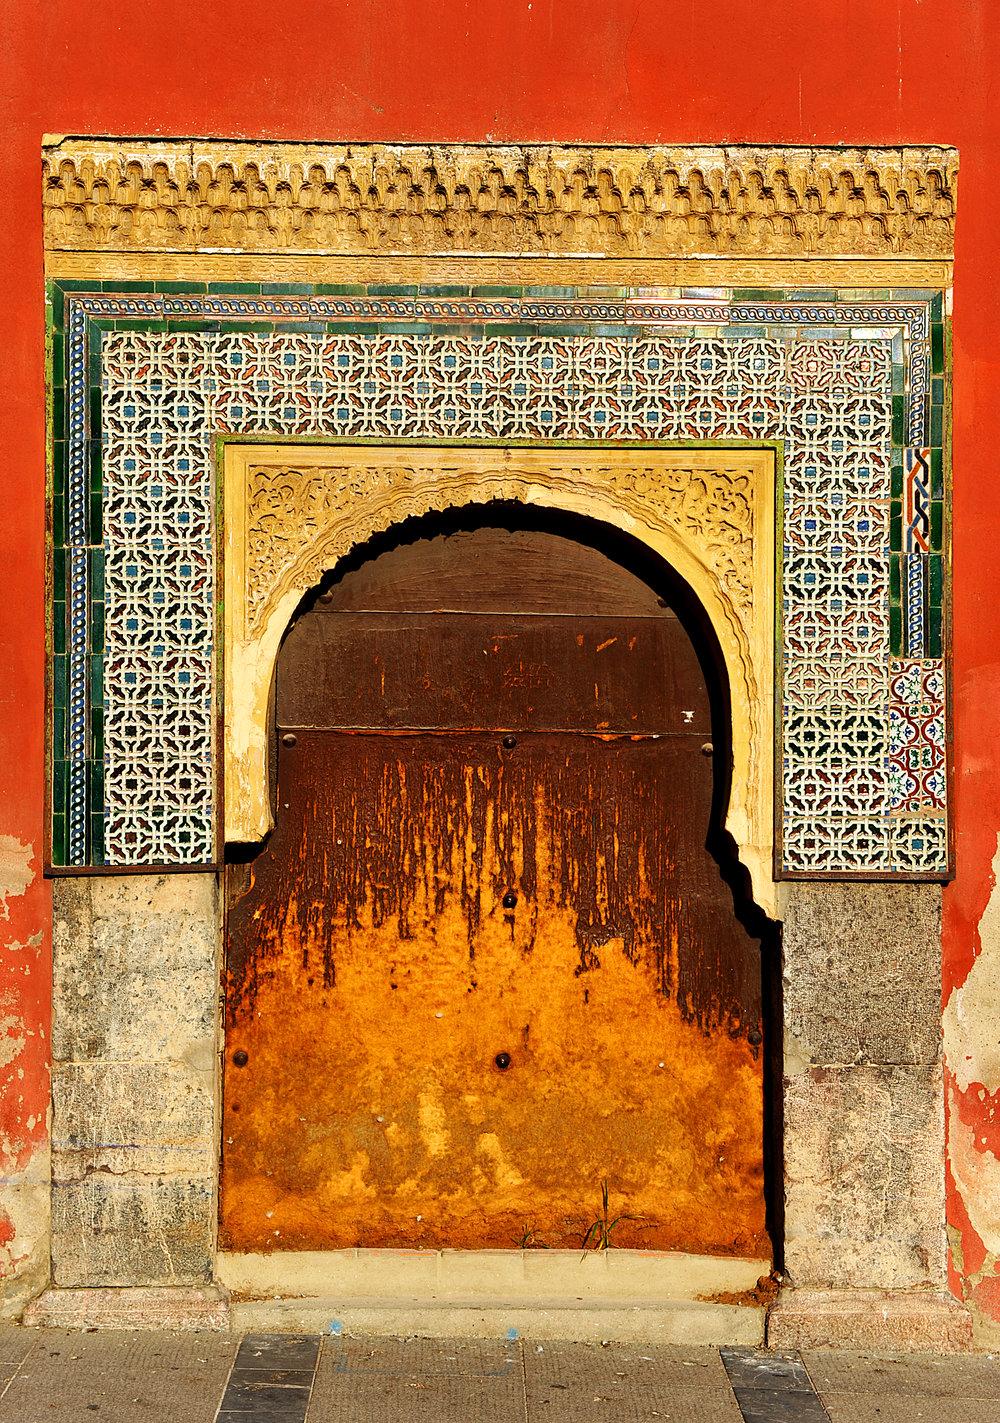 Moorish architecture in Cordoba, Andalusia, Spain.jpg